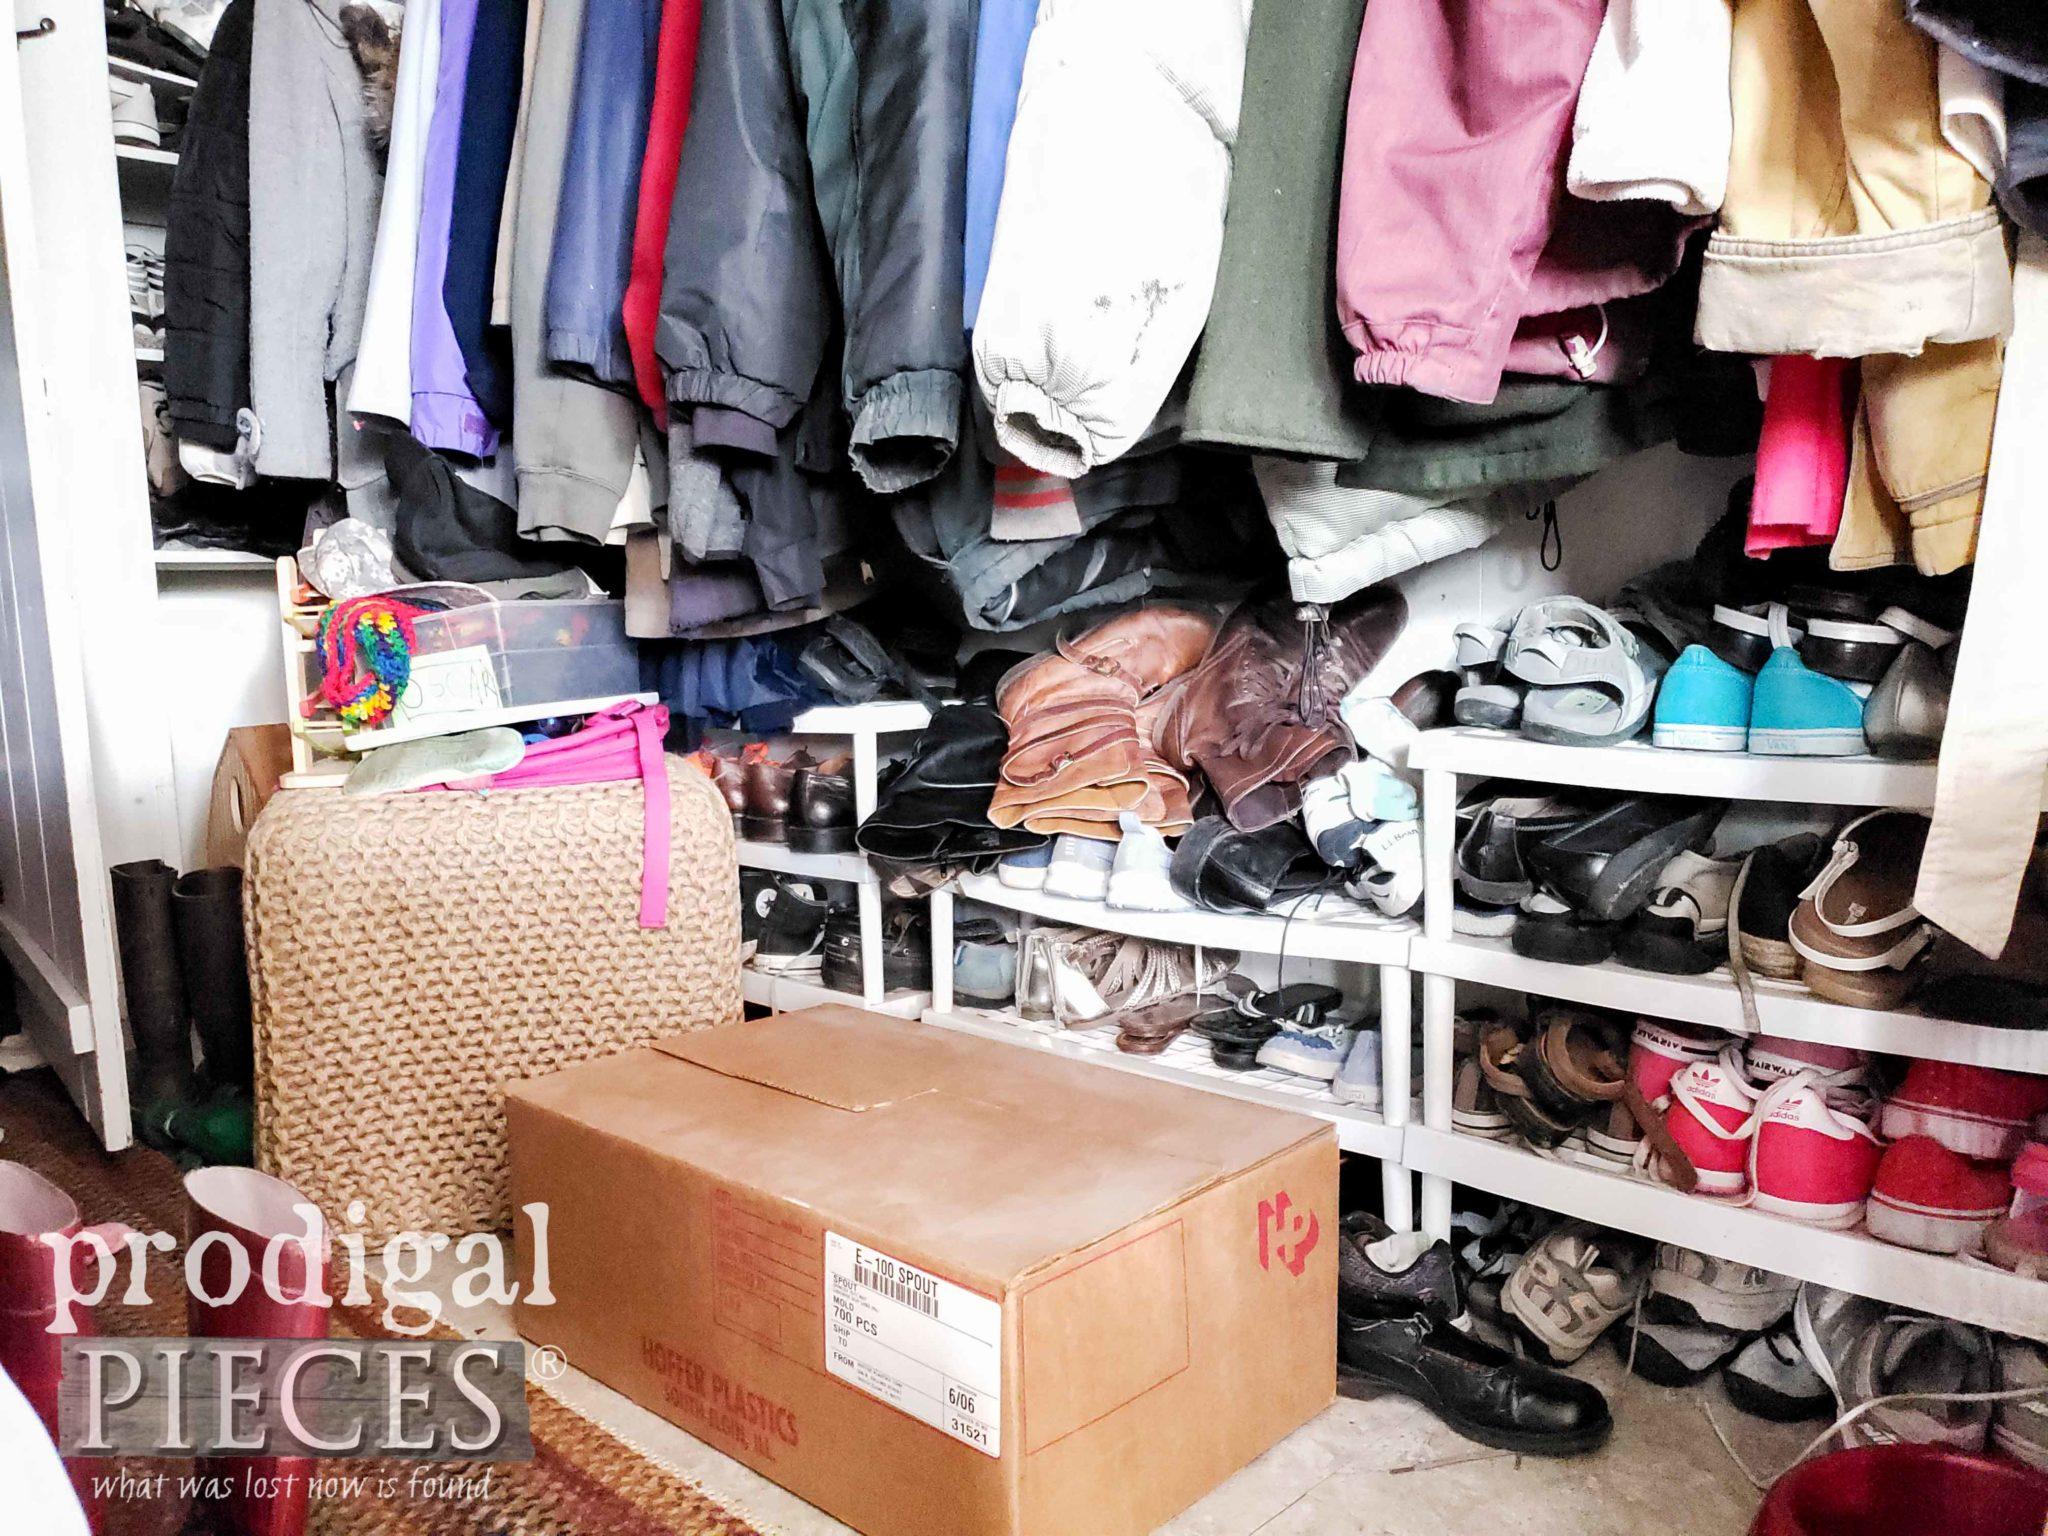 Shoe Storage Shelves Before Mudroom Update by Prodigal Pieces | prodigalpieces.com